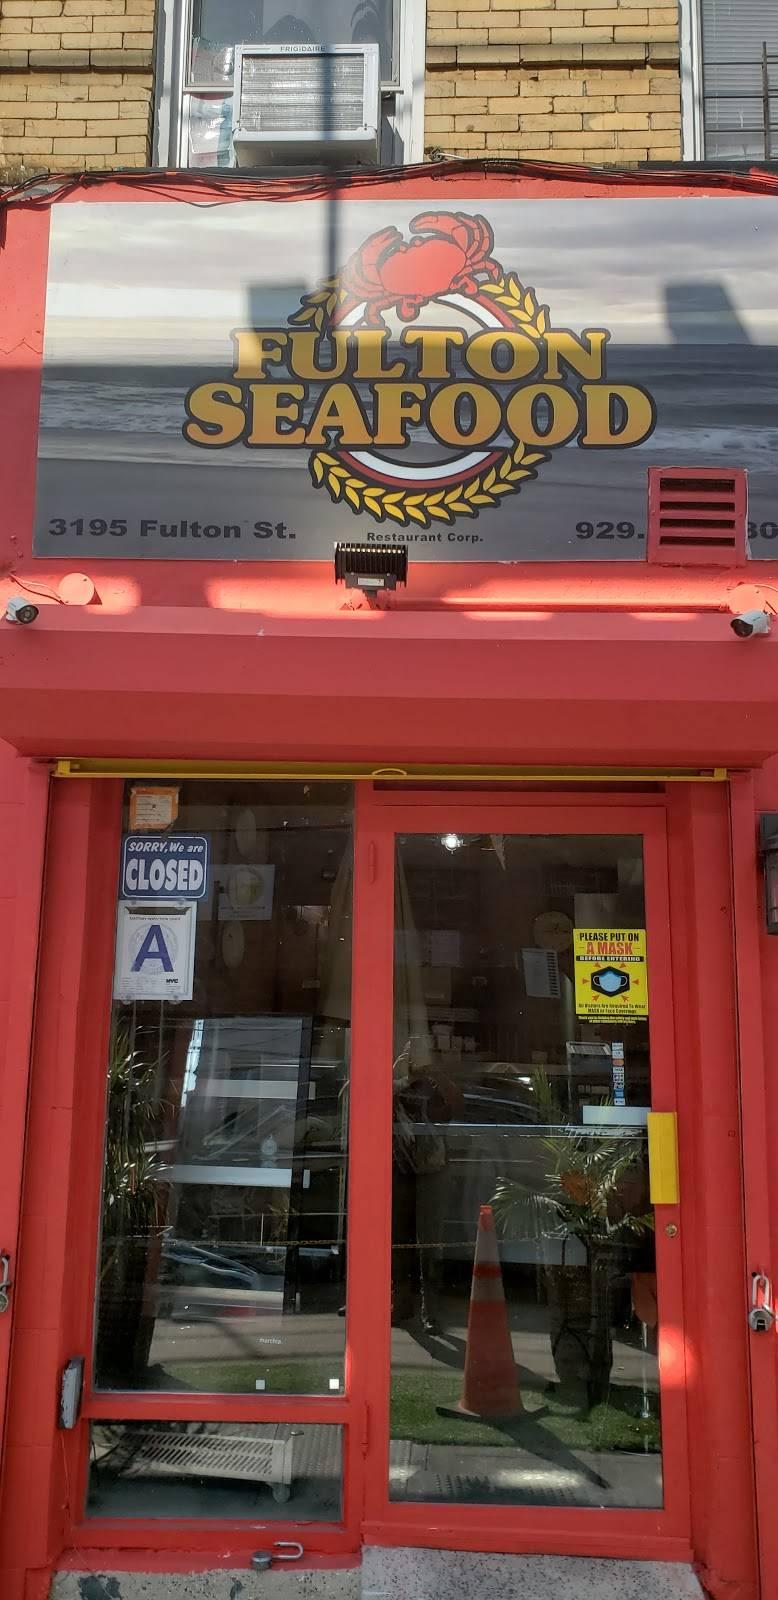 Fulton seafood | restaurant | 3195 Fulton St, Brooklyn, NY 11208, USA